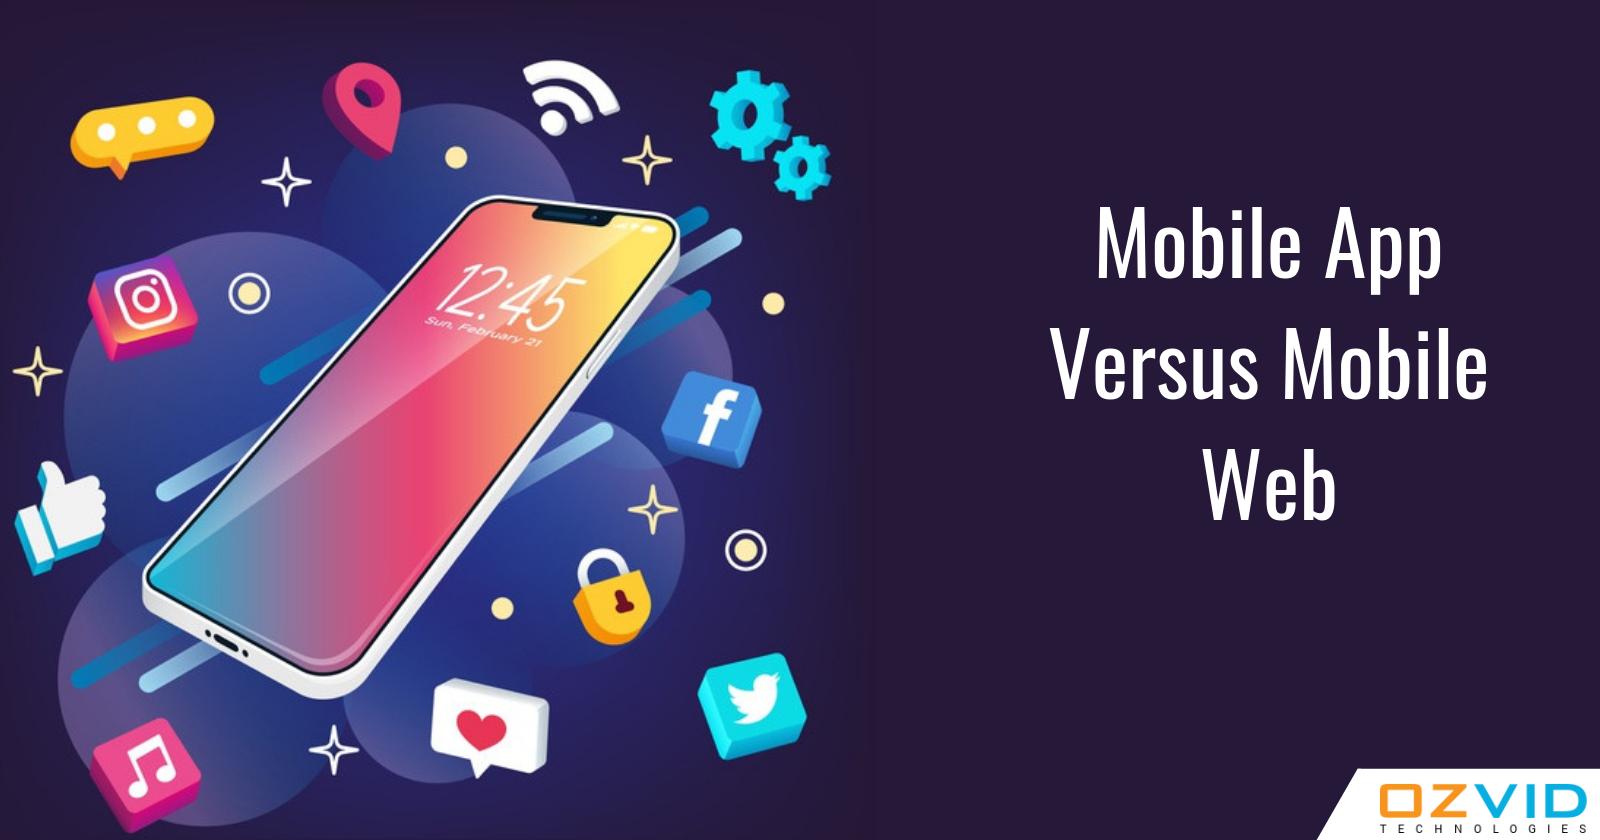 What Make Mobile Apps Better Than Mobile Website?